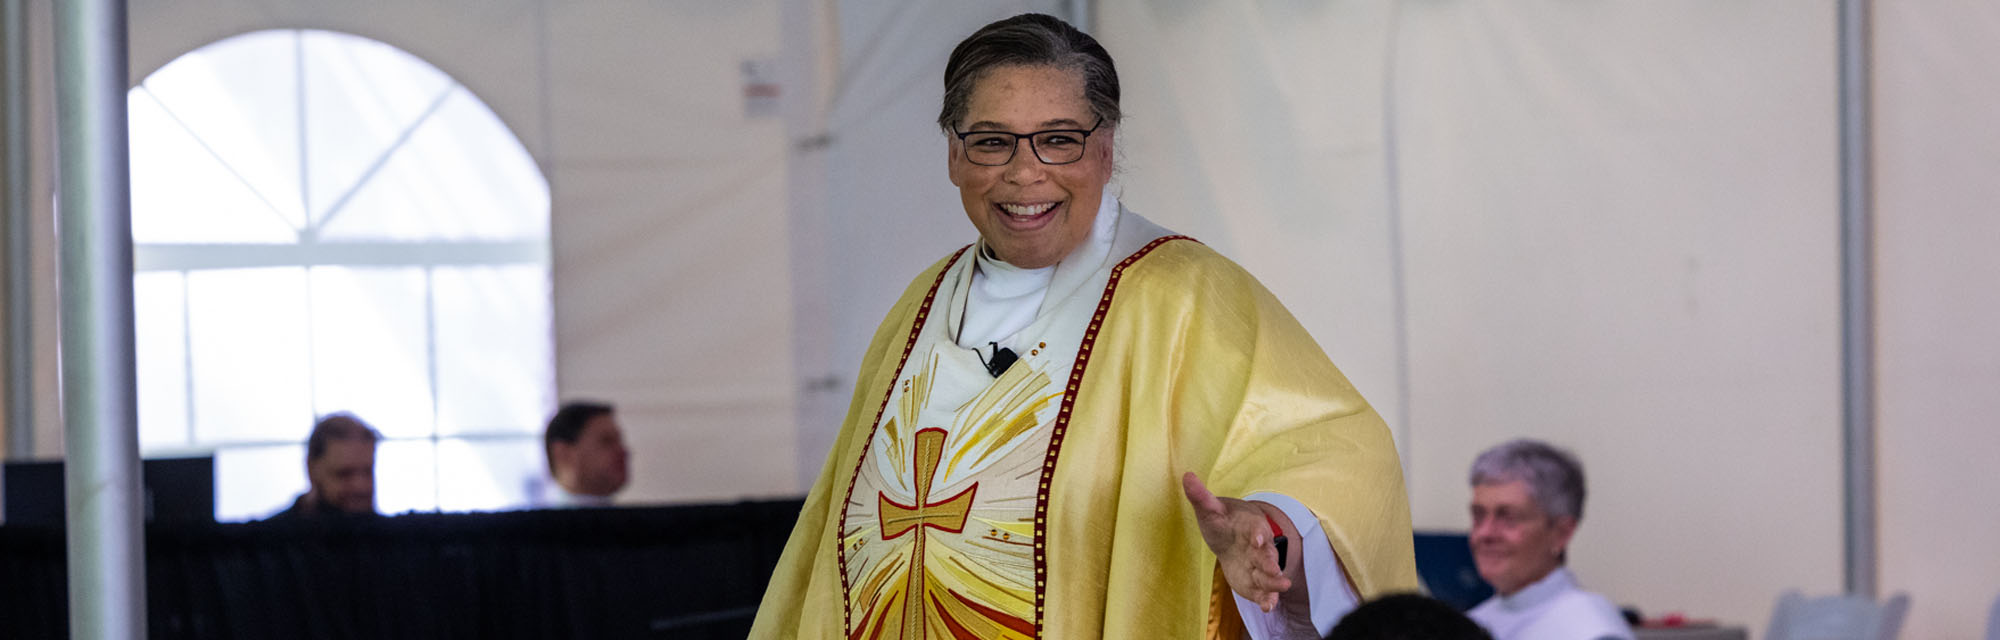 Bishop Hughes preaching at the 147th Convention. CYNTHIA L. BLACK PHOTO